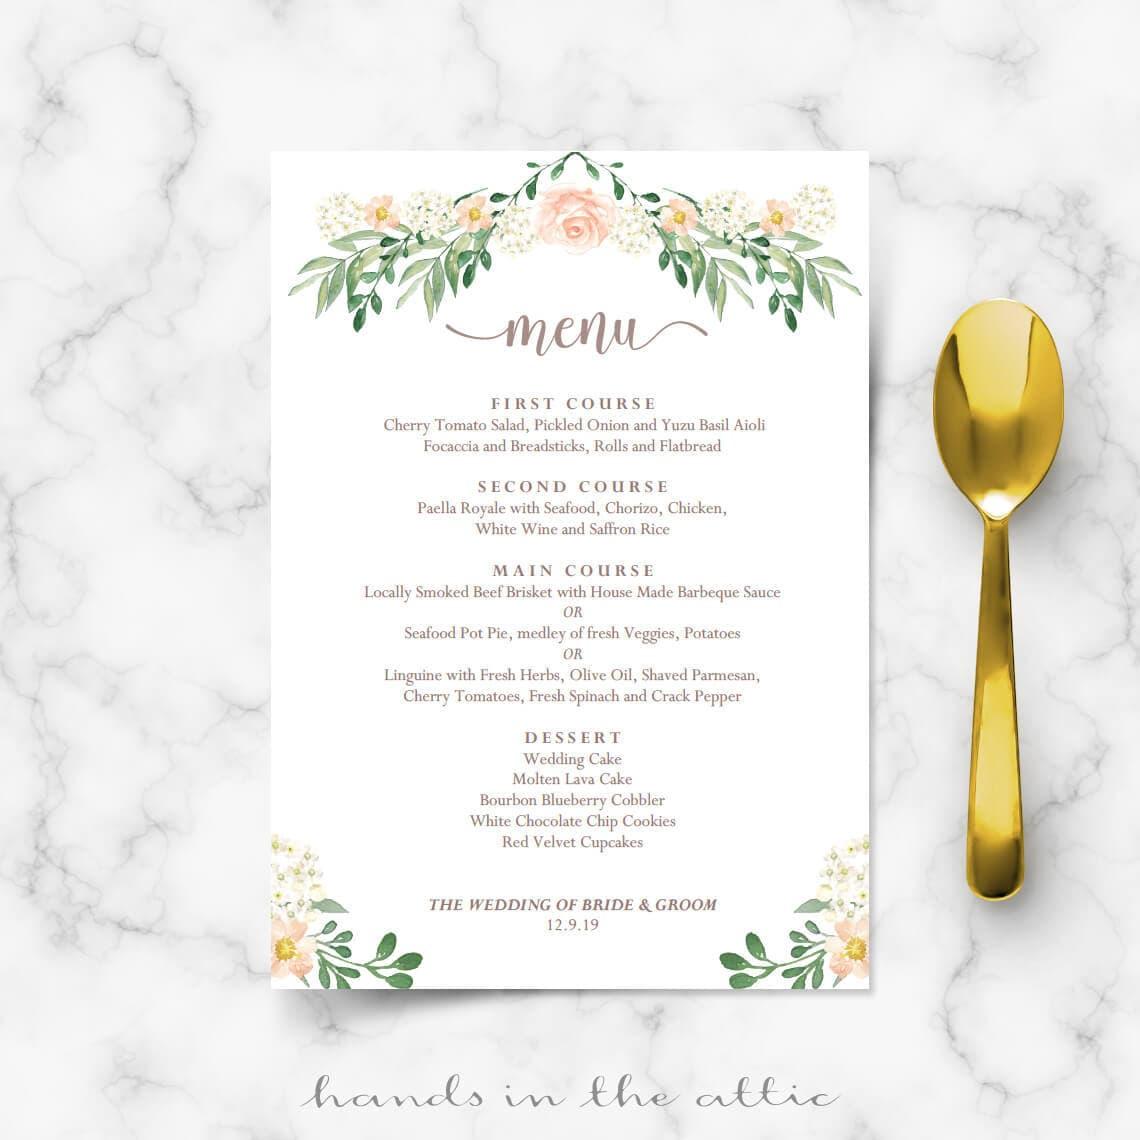 Wedding Dinner Menu Cards For Wedding Buffet Menu Ideas: Rustic Wedding Menu Rehearsal Dinner Menu Template Sit